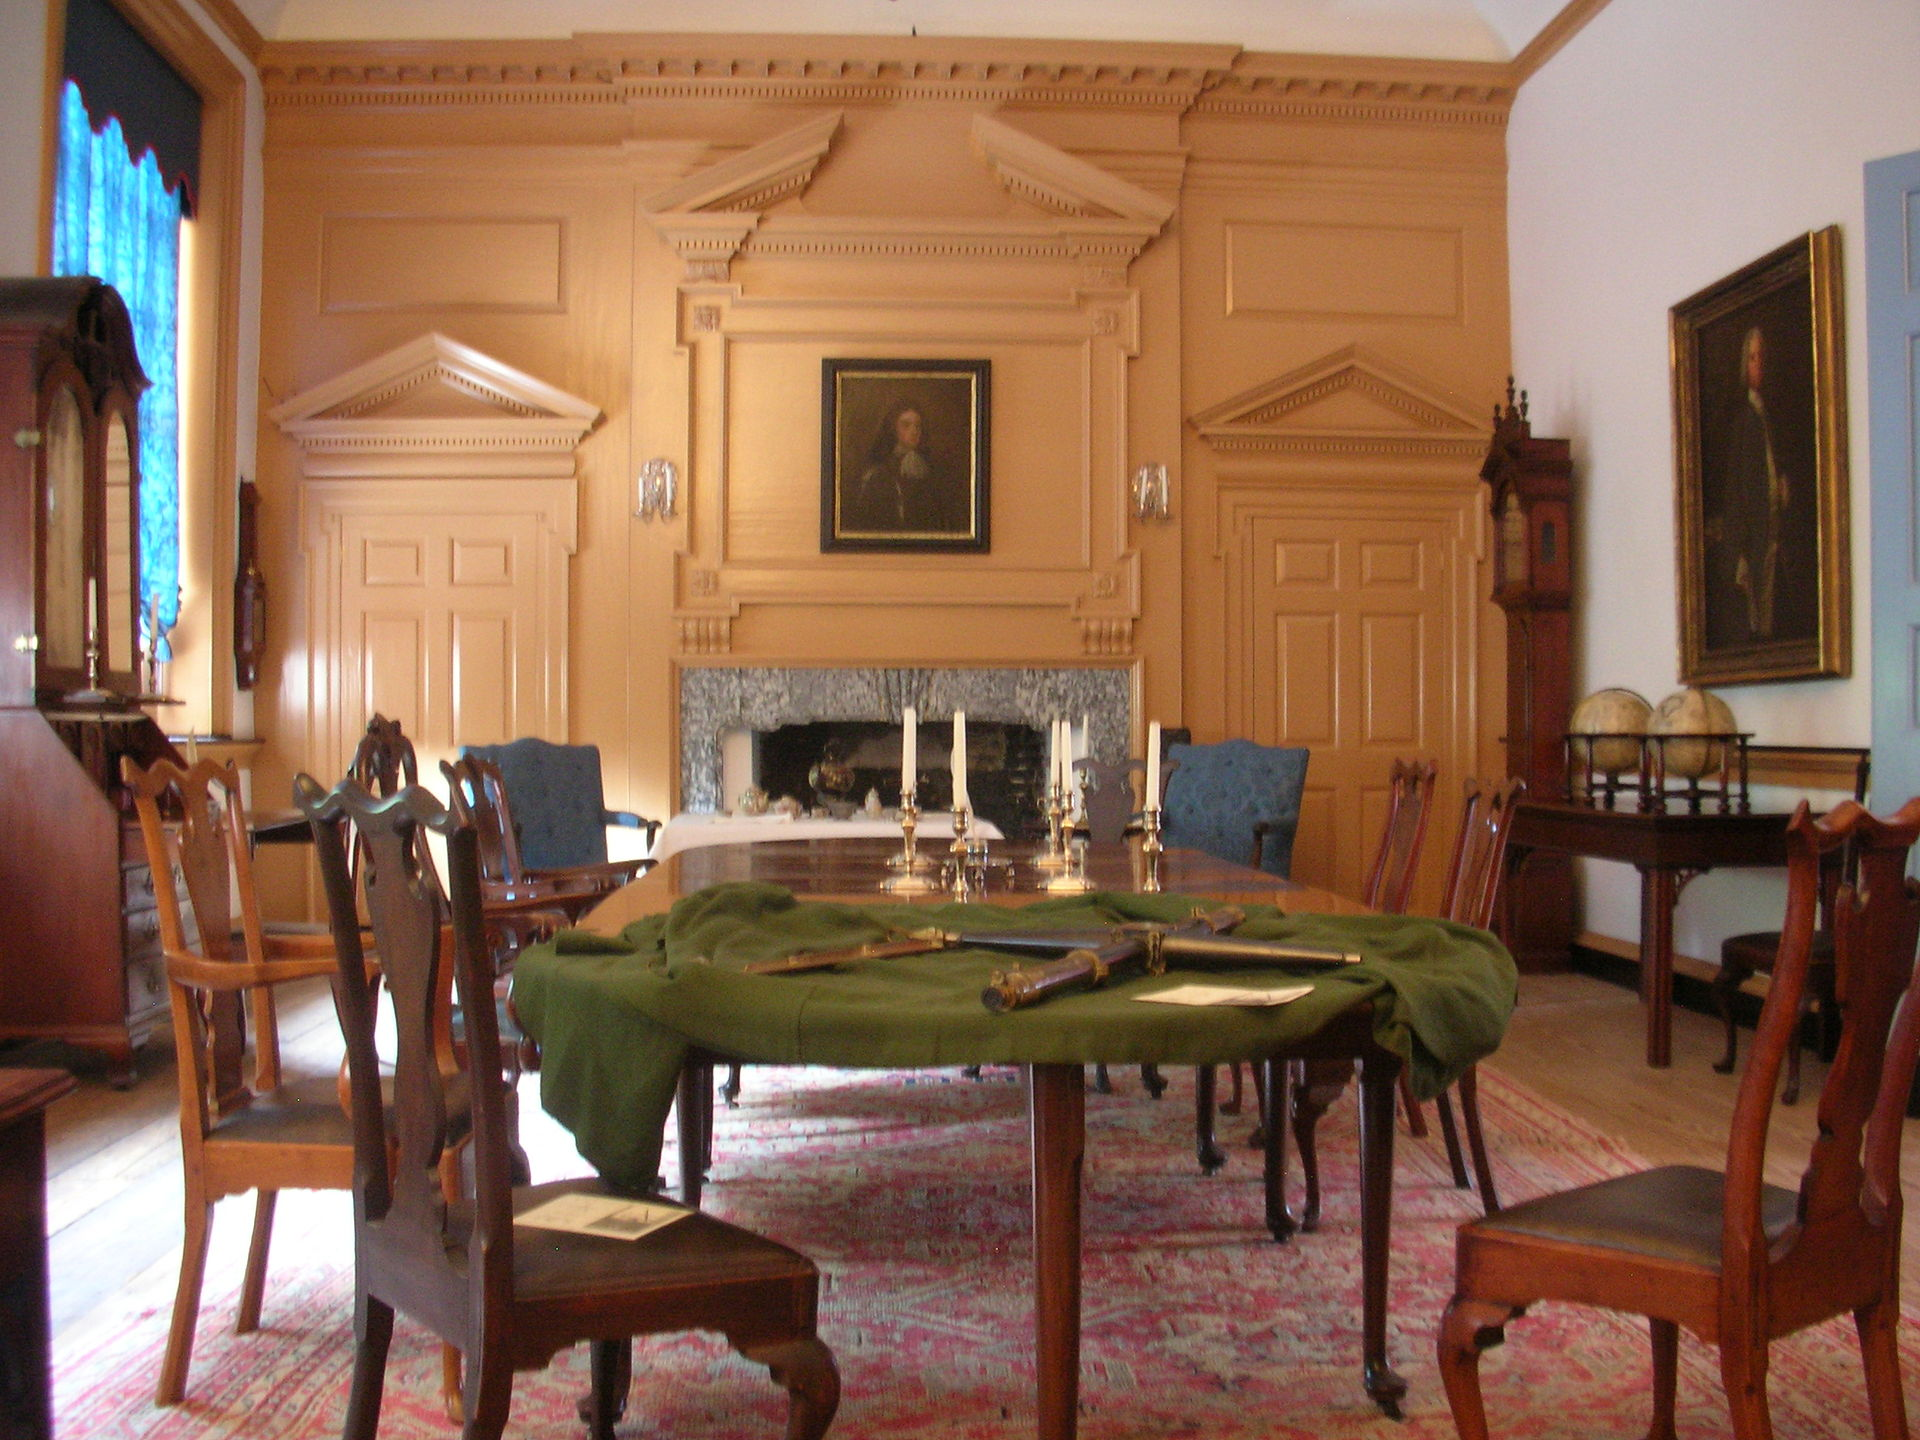 Queen Anne style furniture  Wikipedia